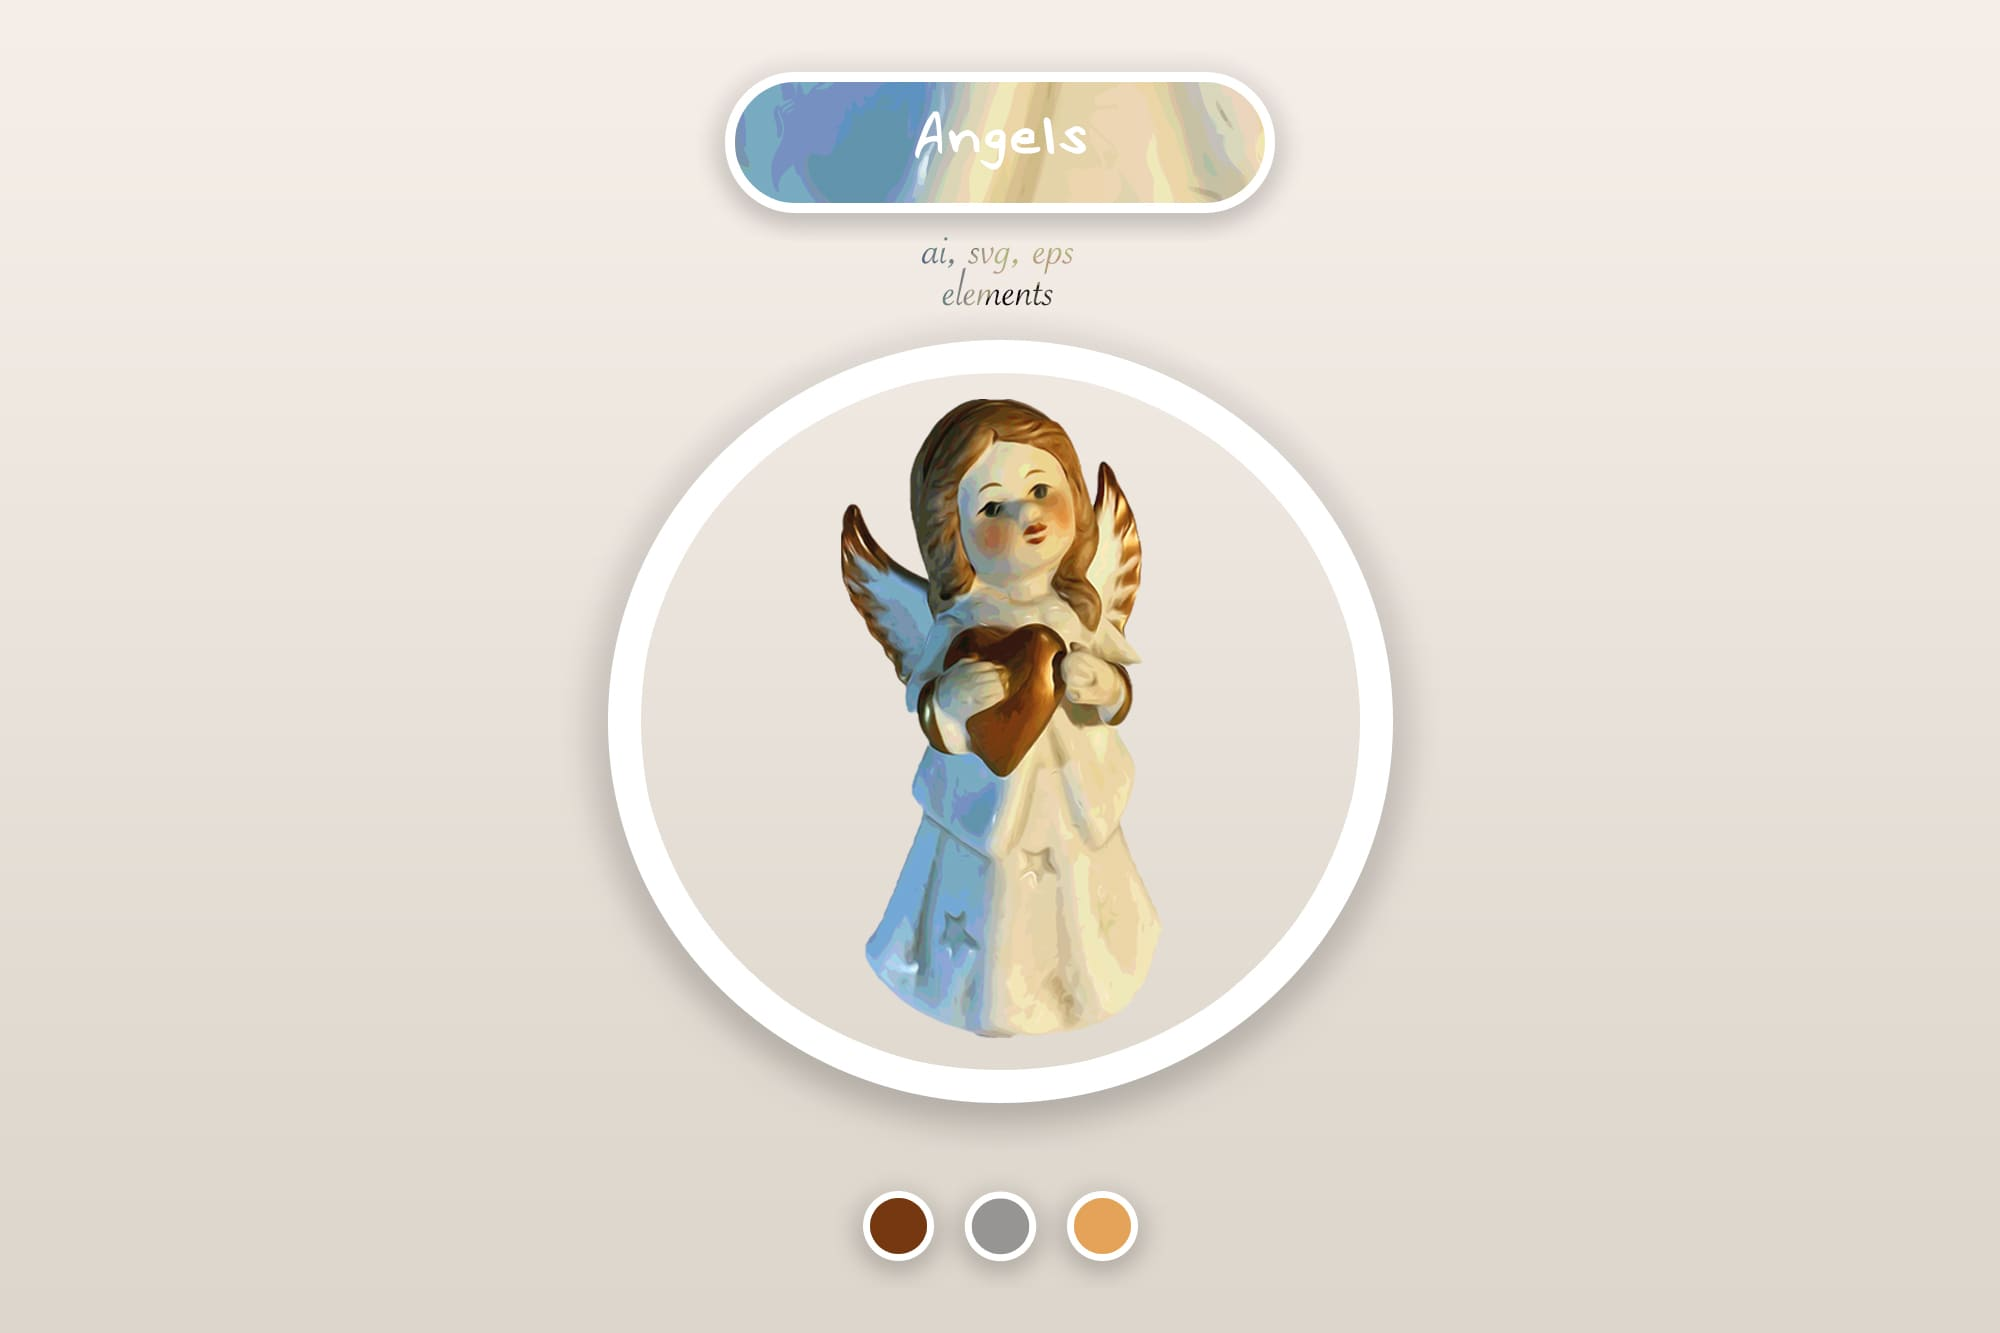 496 Christmas Illustrations: Christmas Vectors Bundle SVG, EPS, AI - Angel 1a